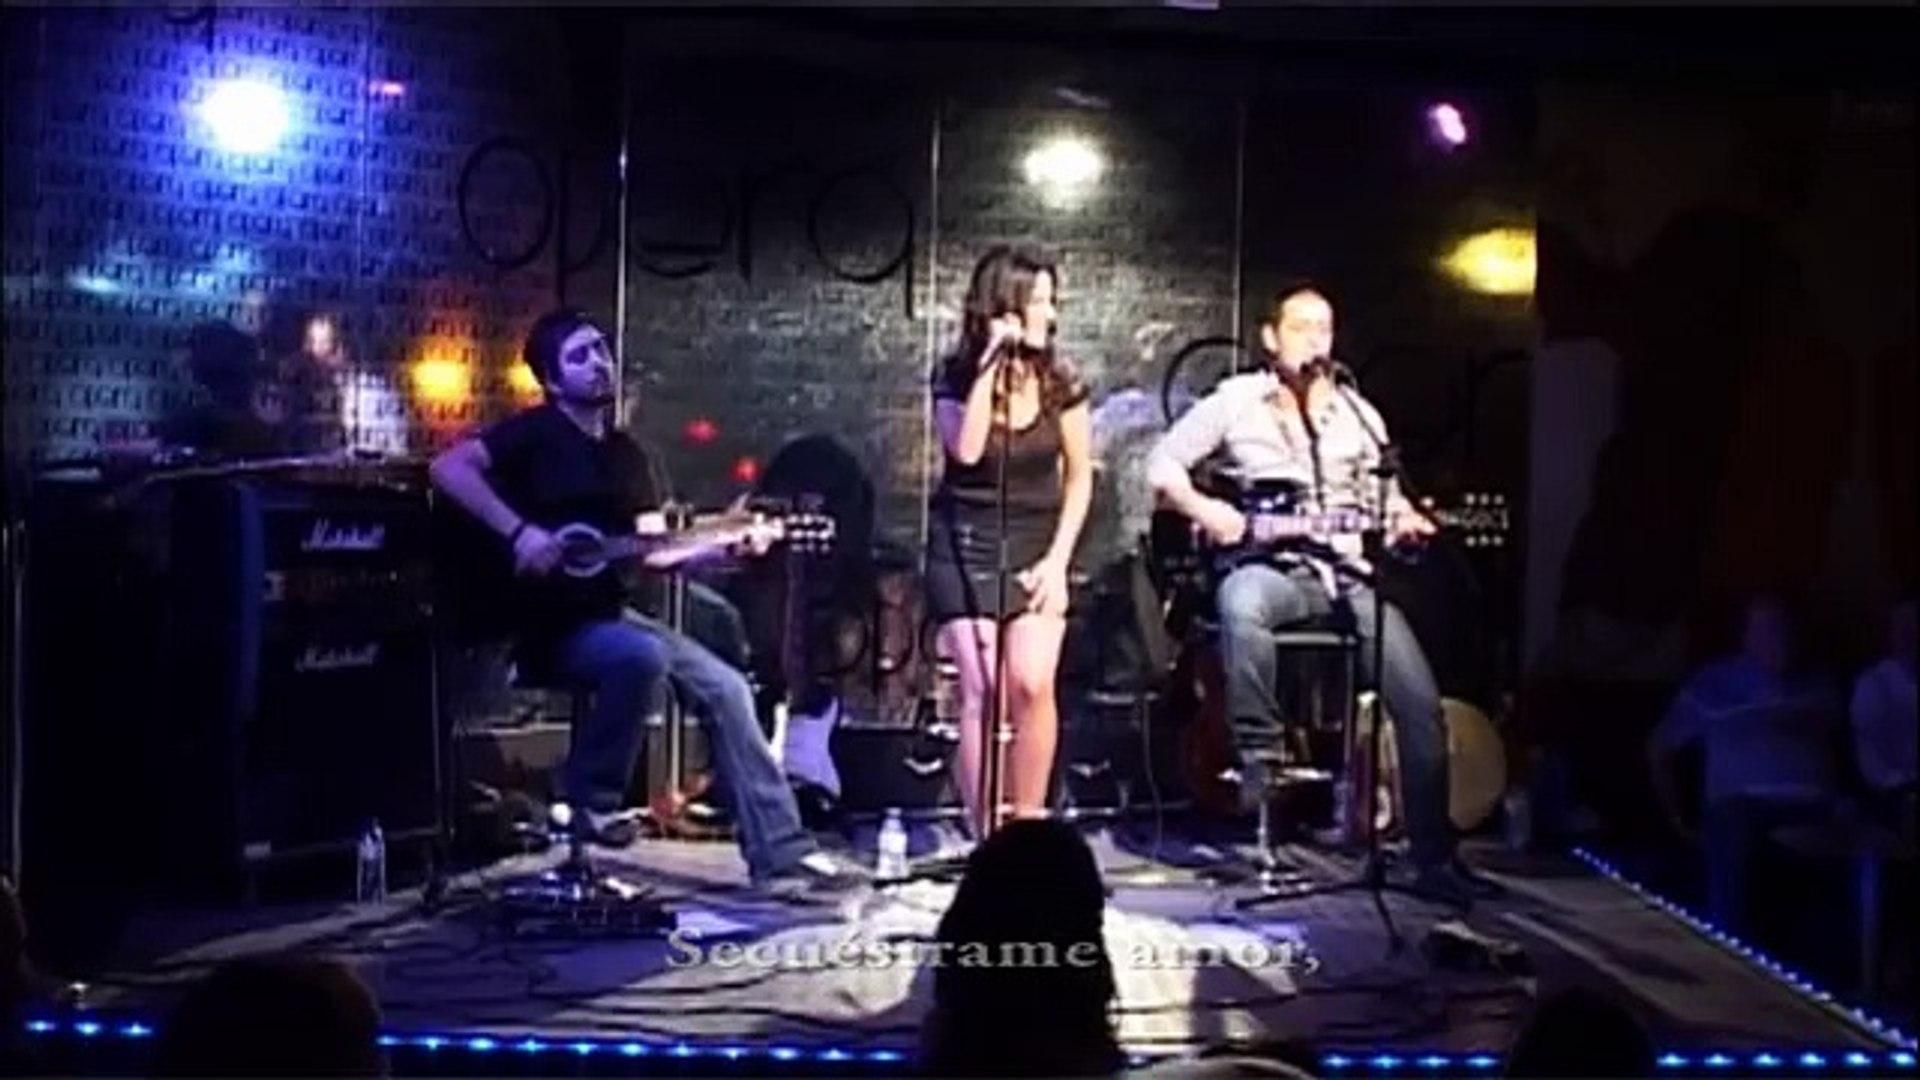 MUSICA, BALADAS ROMANTICAS MIX 2015 - Videos de MUSICA ROMANTICA VARIADA